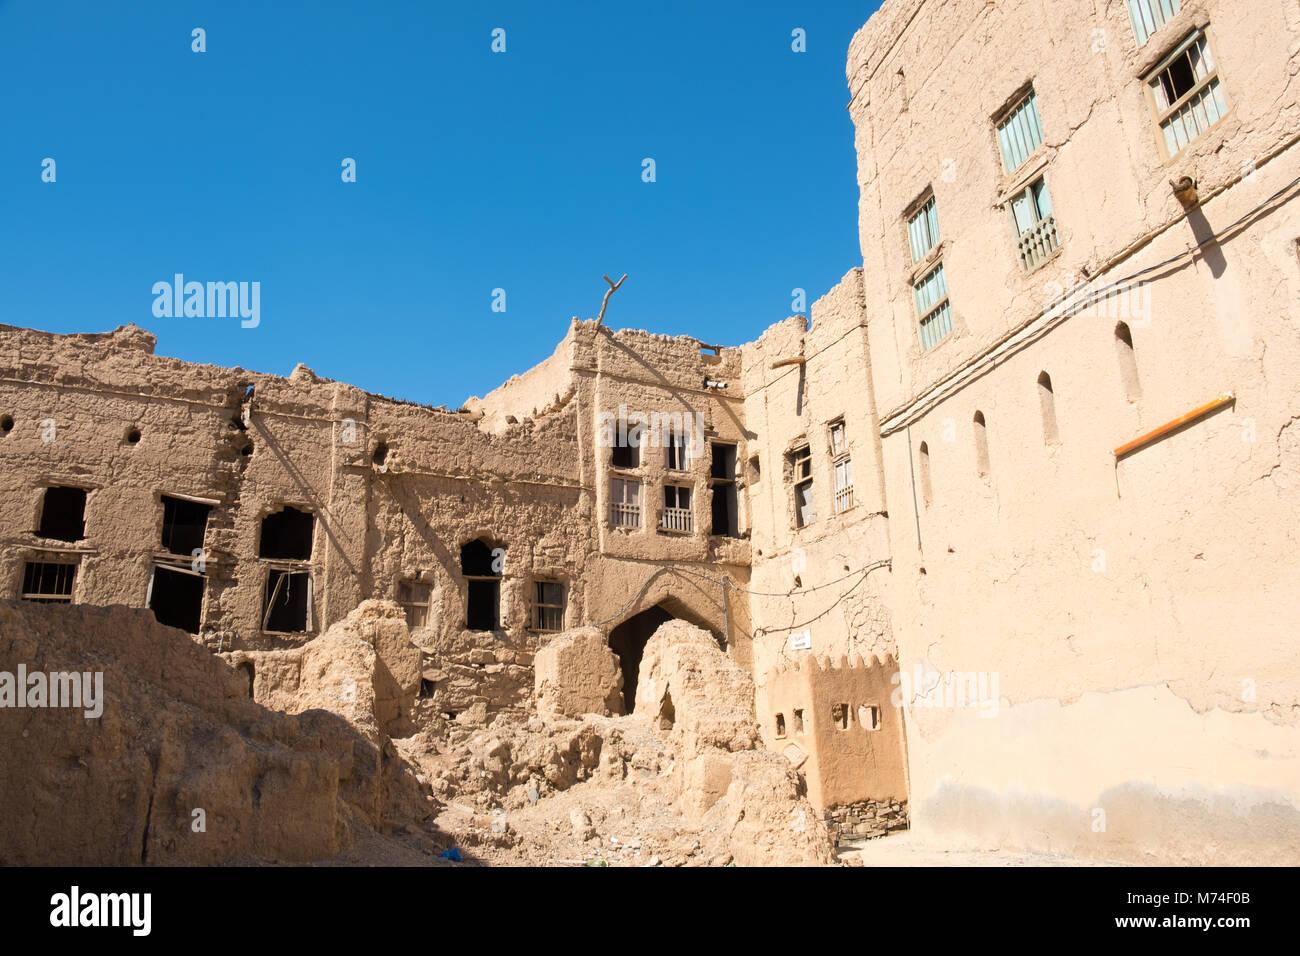 Old village of Al Hamra , Nizwa, Sultanate of Oman - Stock Image